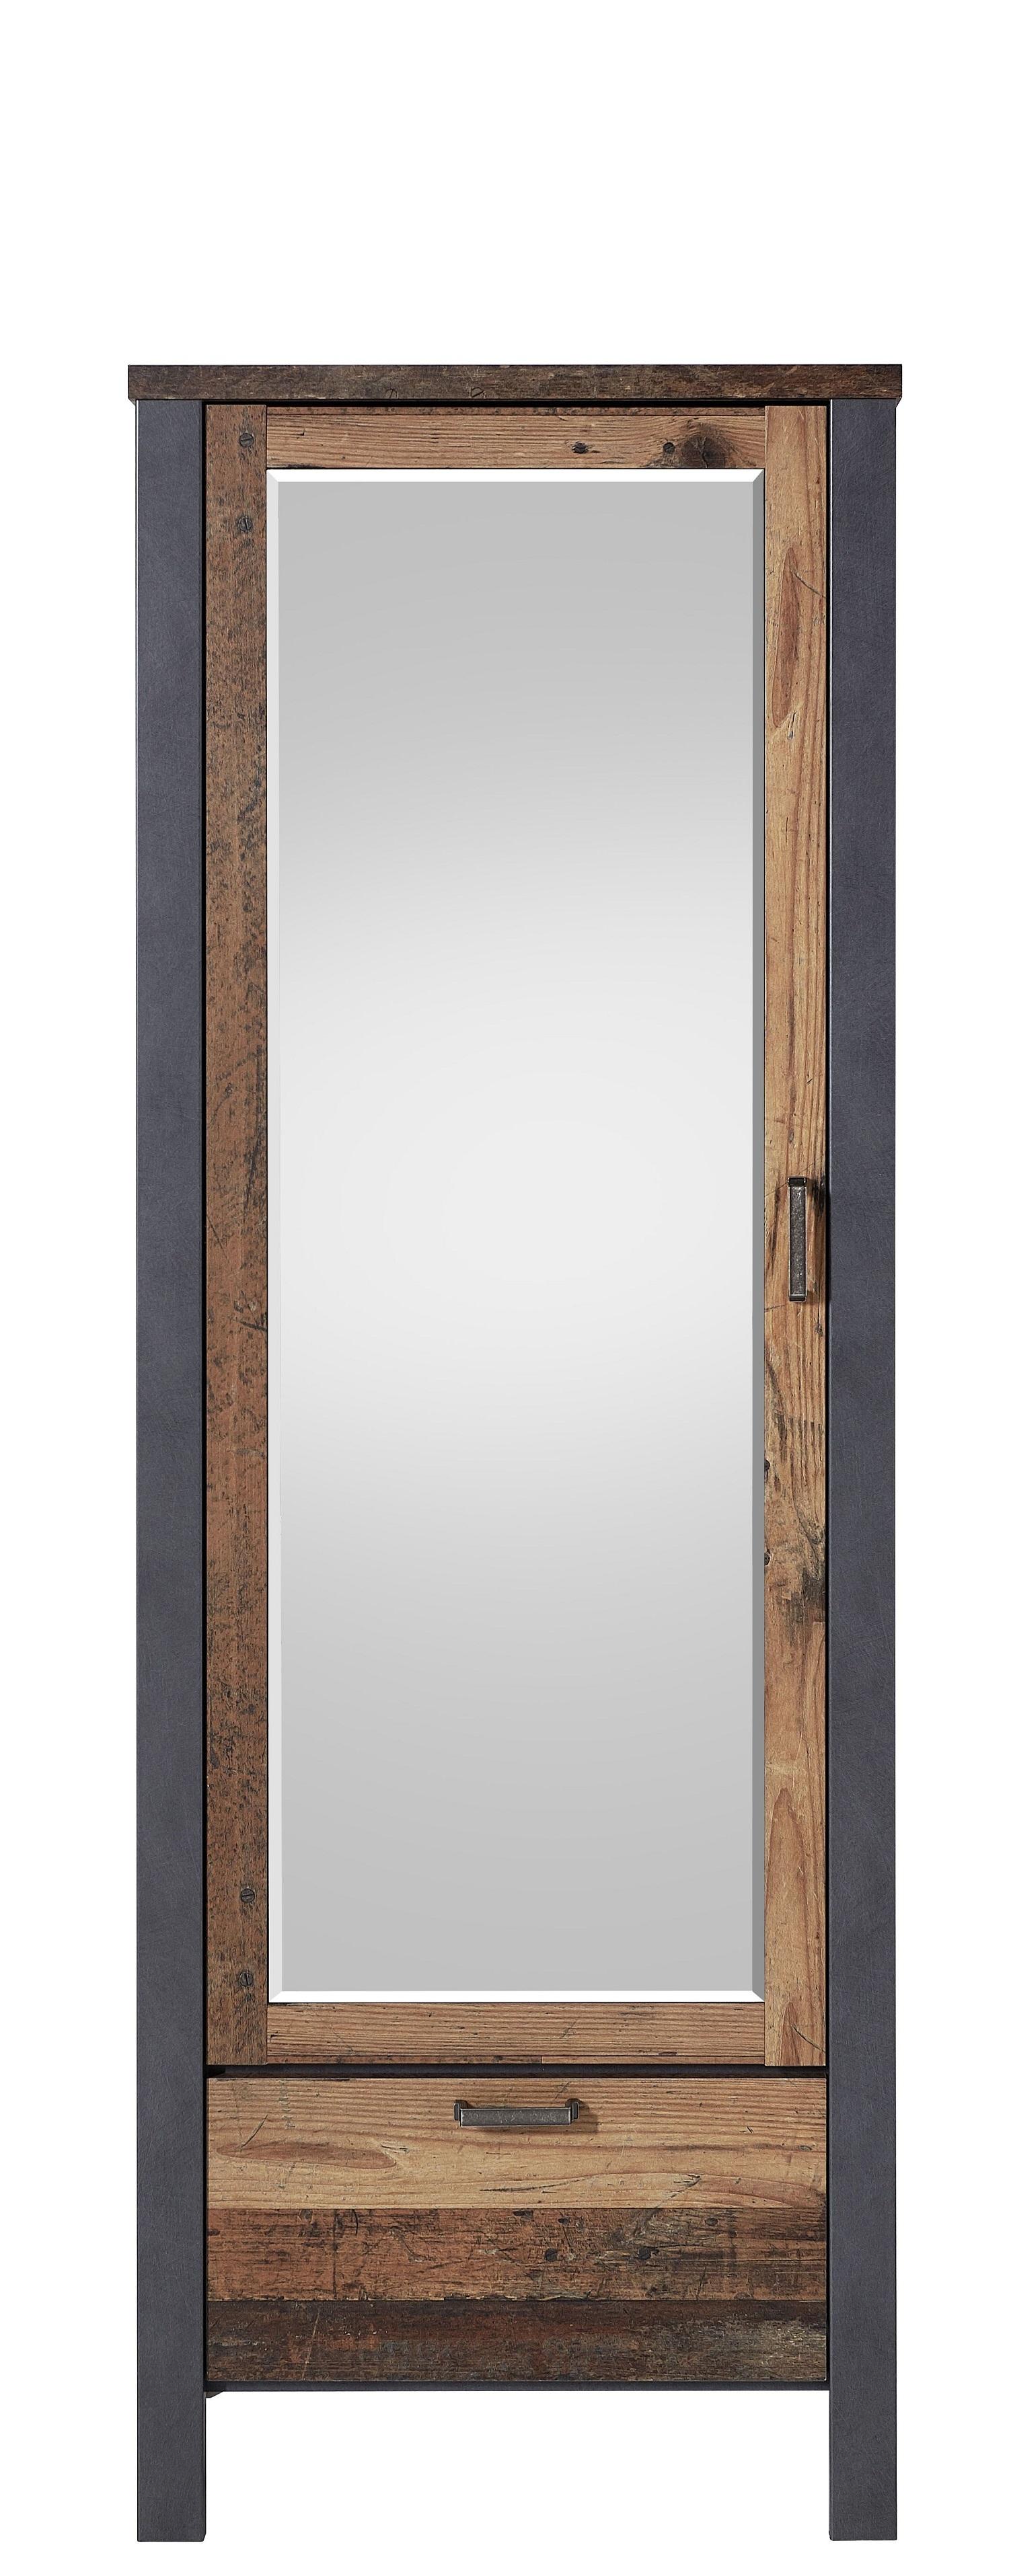 Dulap hol din pal cu oglinda, 1 usa si 1 sertar Chelsea Natural / Grafit, l69xA40xH194 cm somproduct.ro